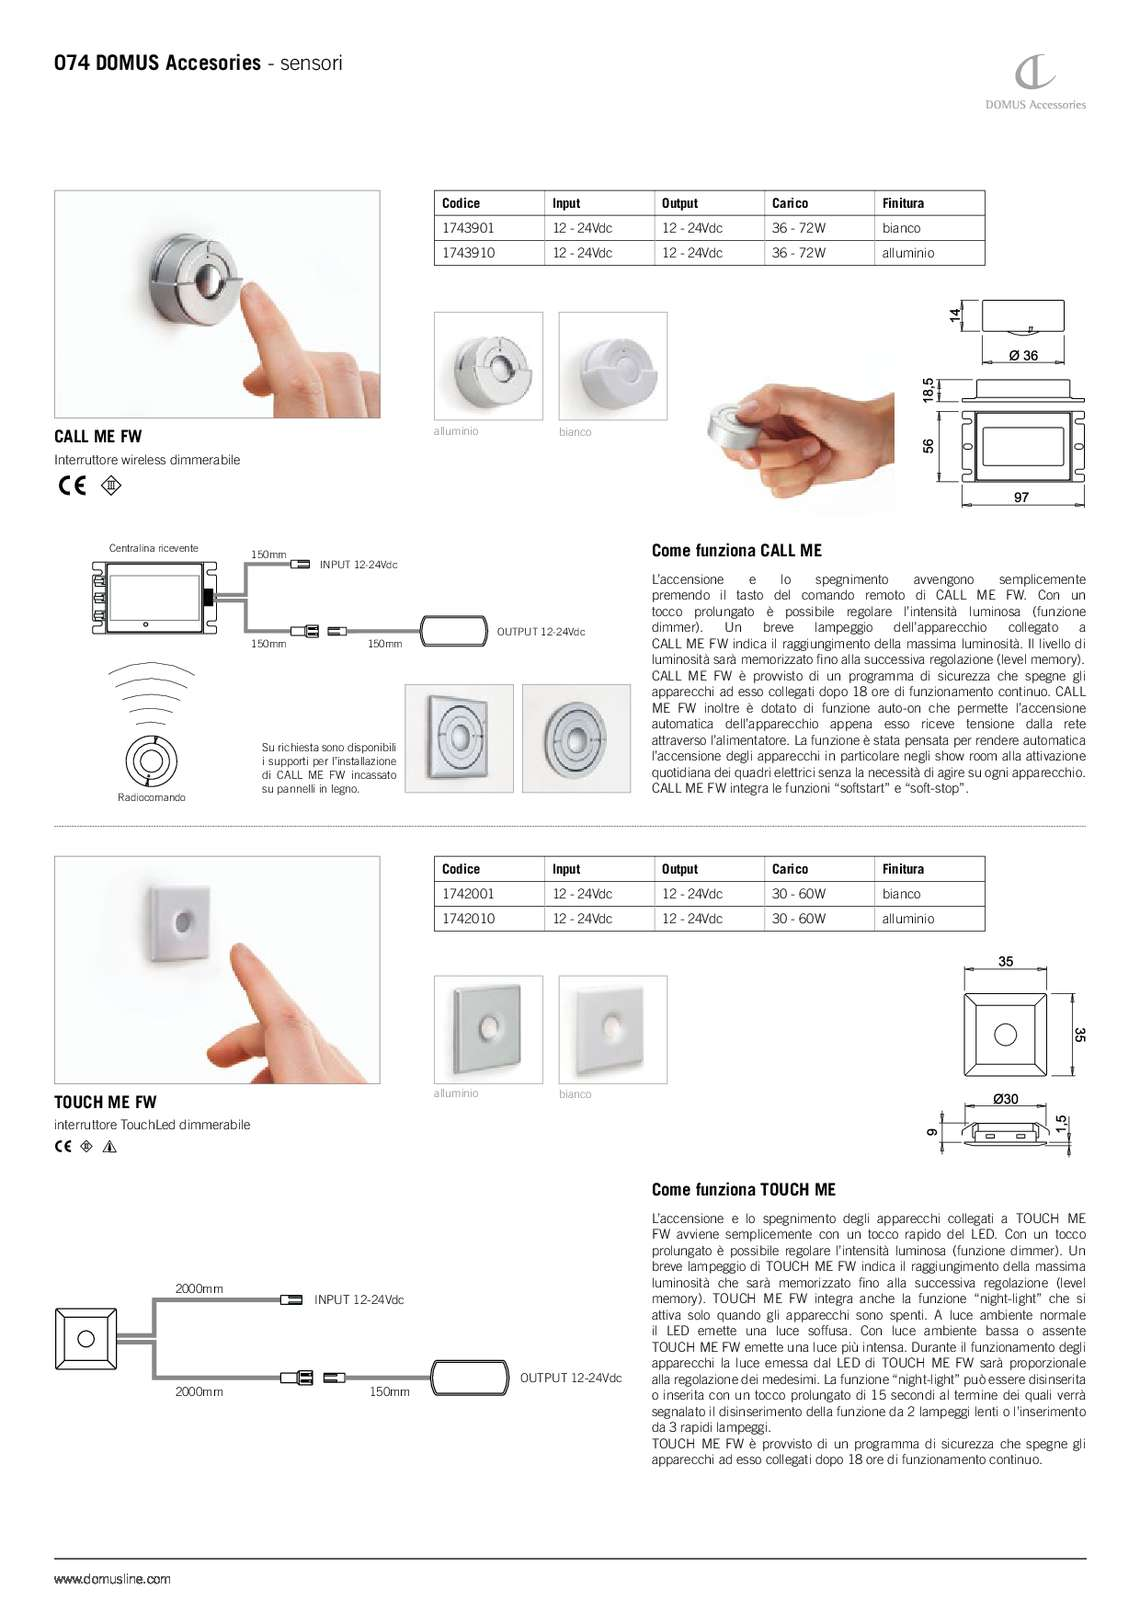 domus-line-illuminazione_26_074.jpg